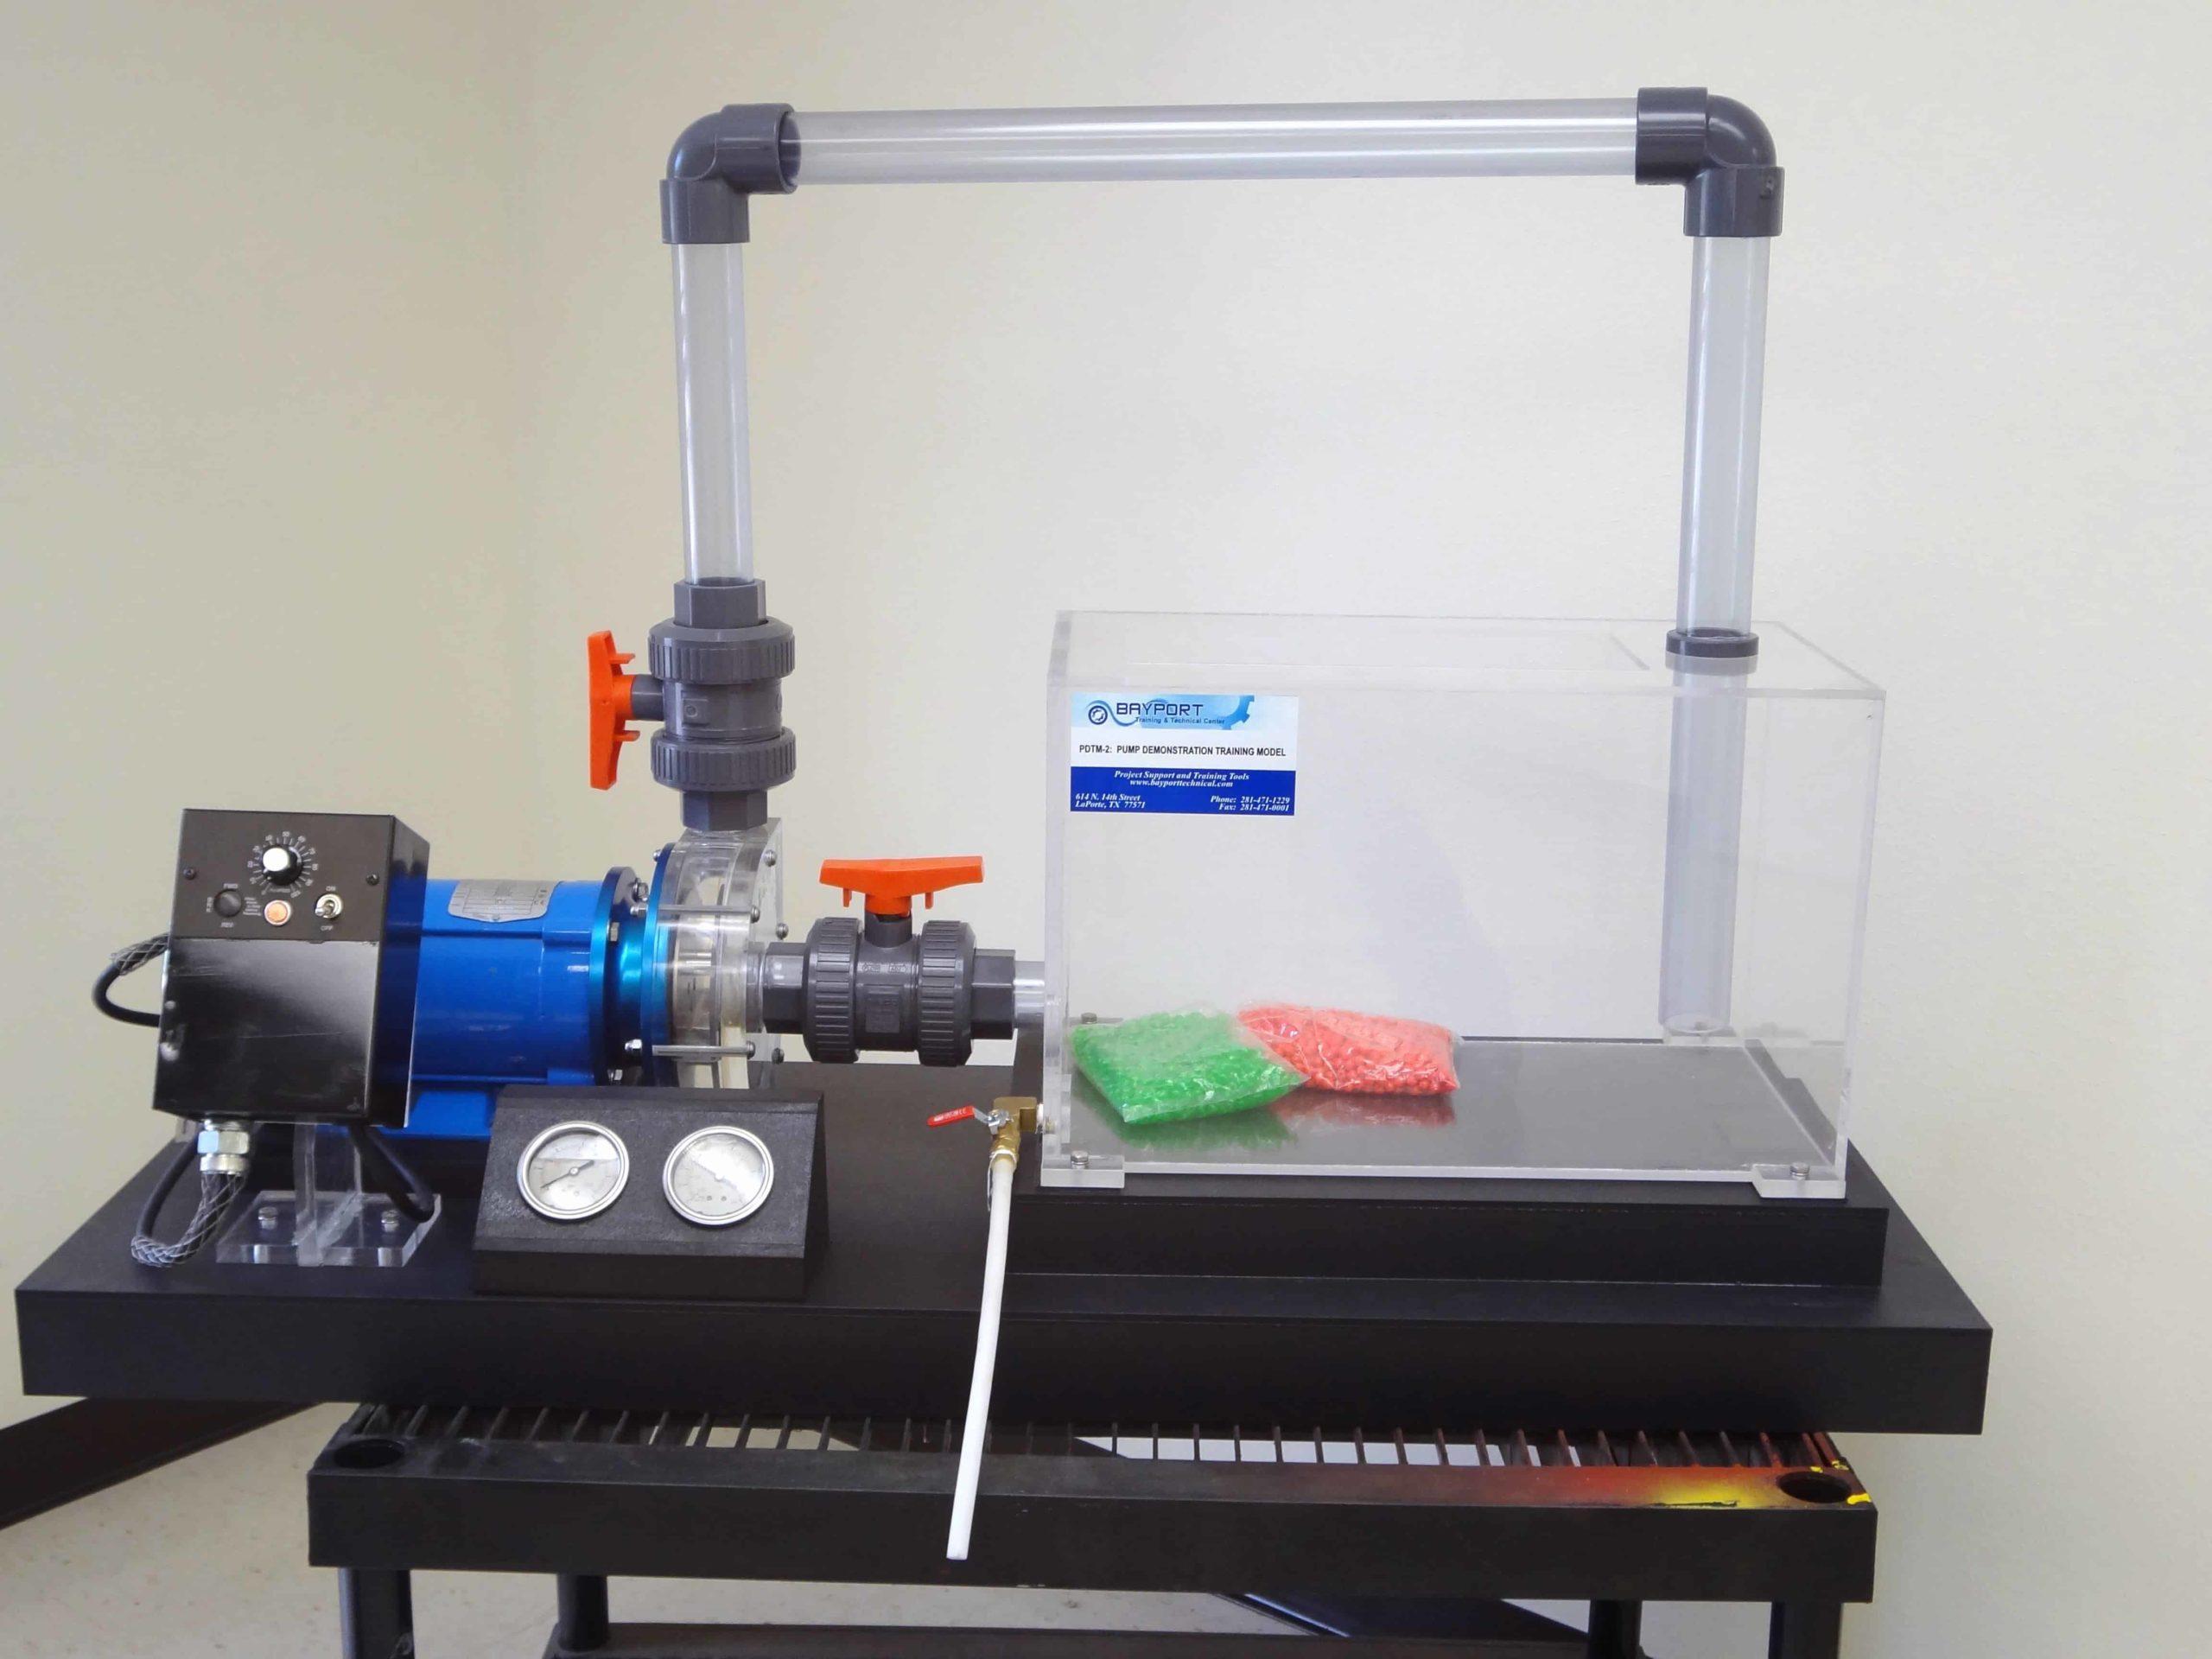 Bayport Technical | Pump Demonstration Training Model